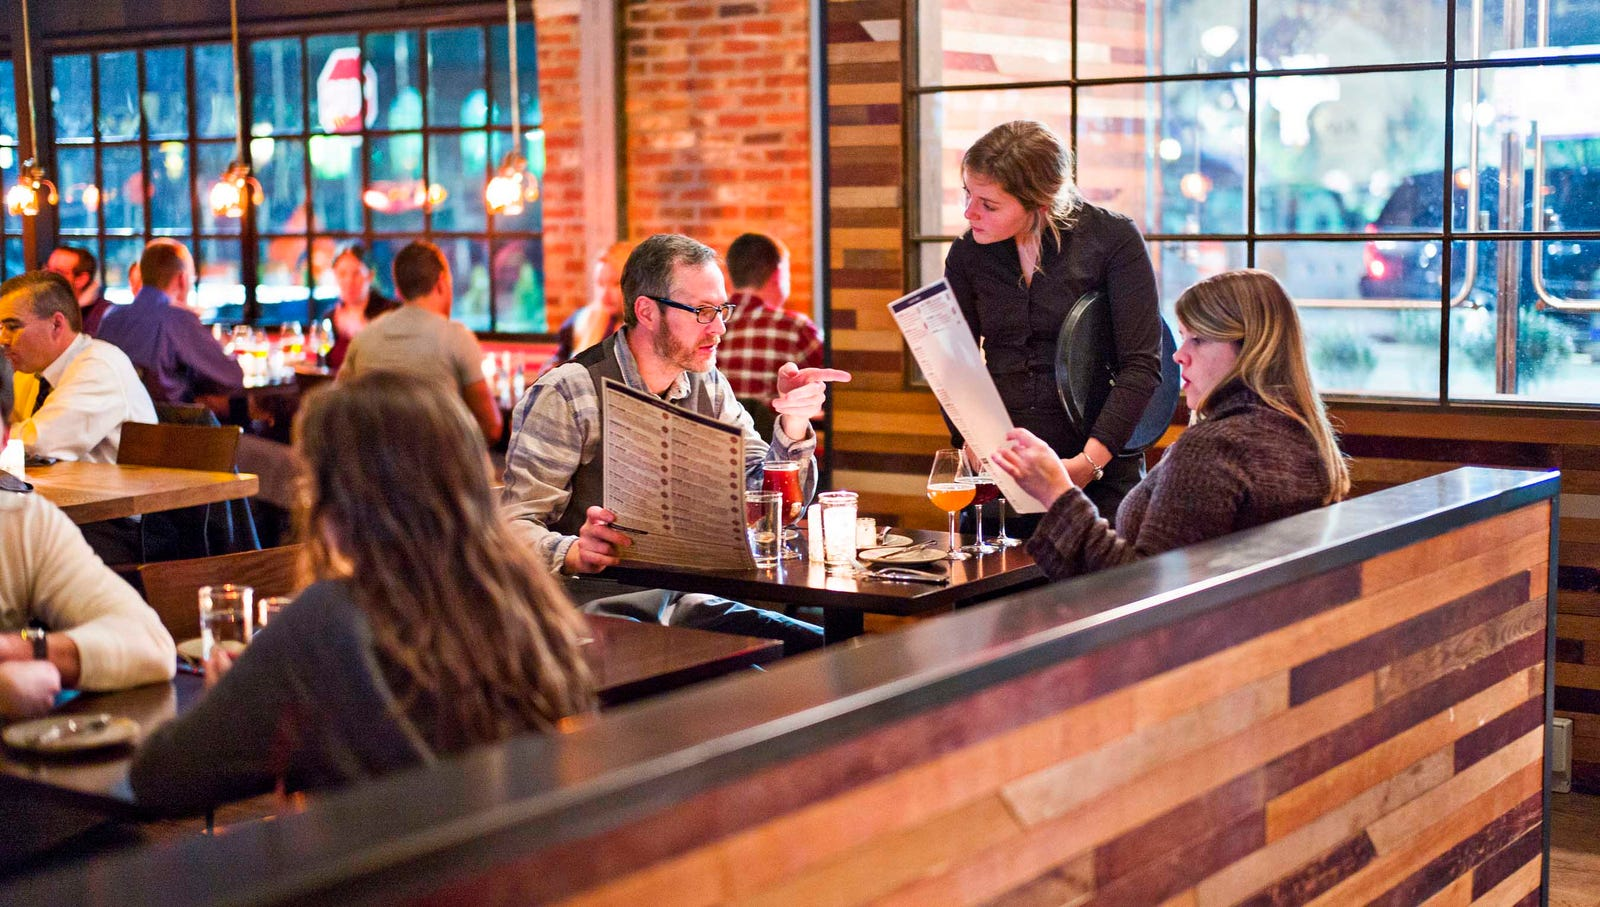 Invasive Restaurant Franchise Spreads To Third State